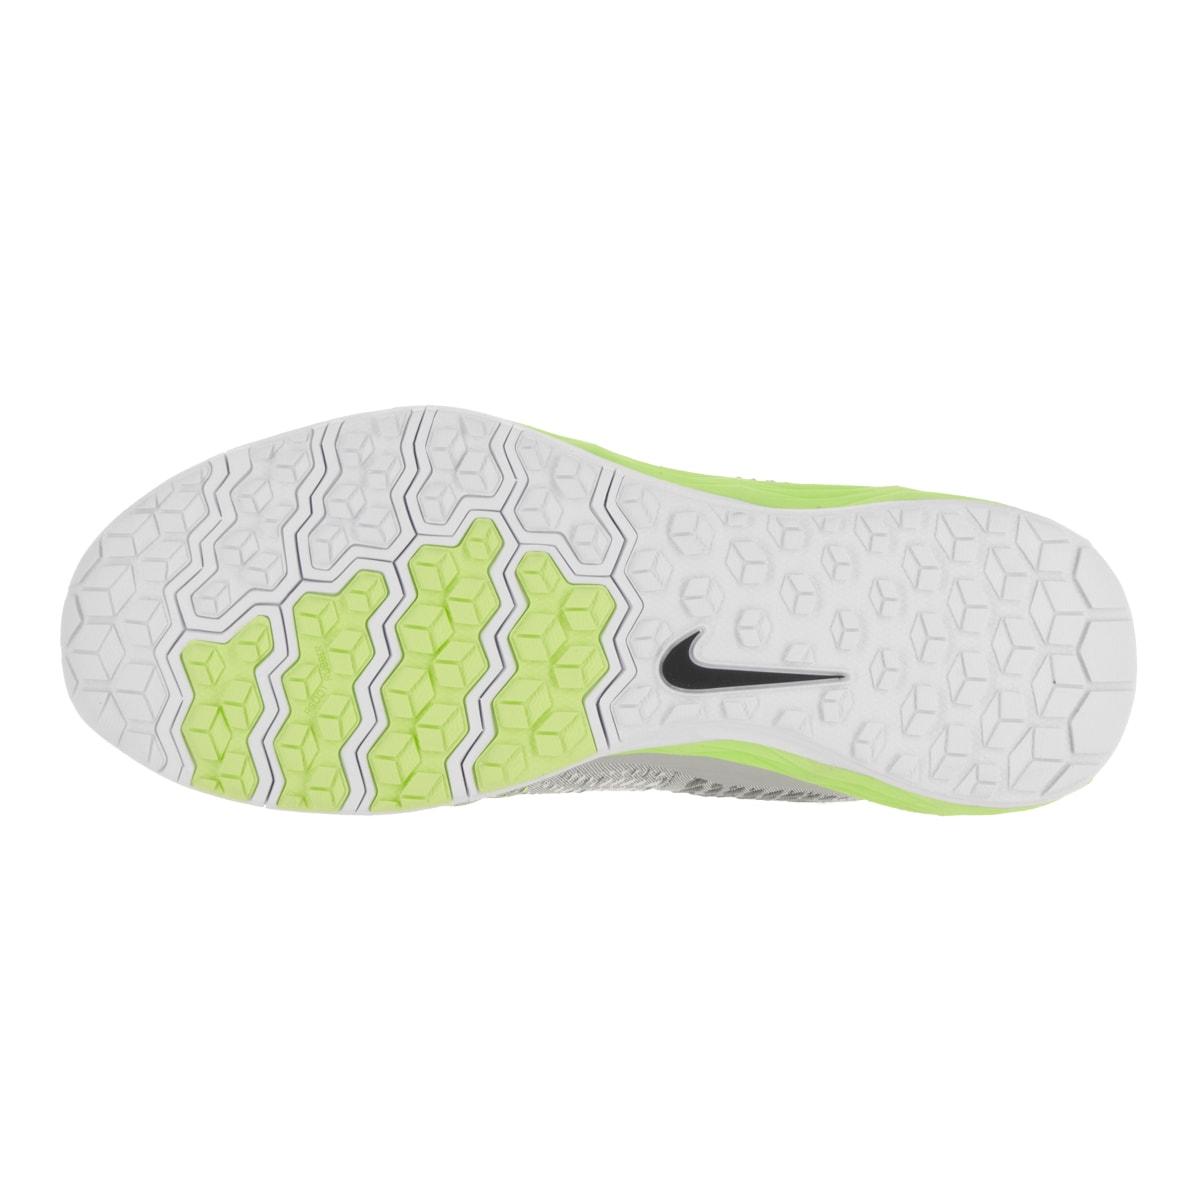 5f78fc5fe969 Shop Nike Men s Lunar Caldra Metallic Silver Blk White Vlt Running Shoe -  Free Shipping Today - Overstock.com - 13394863